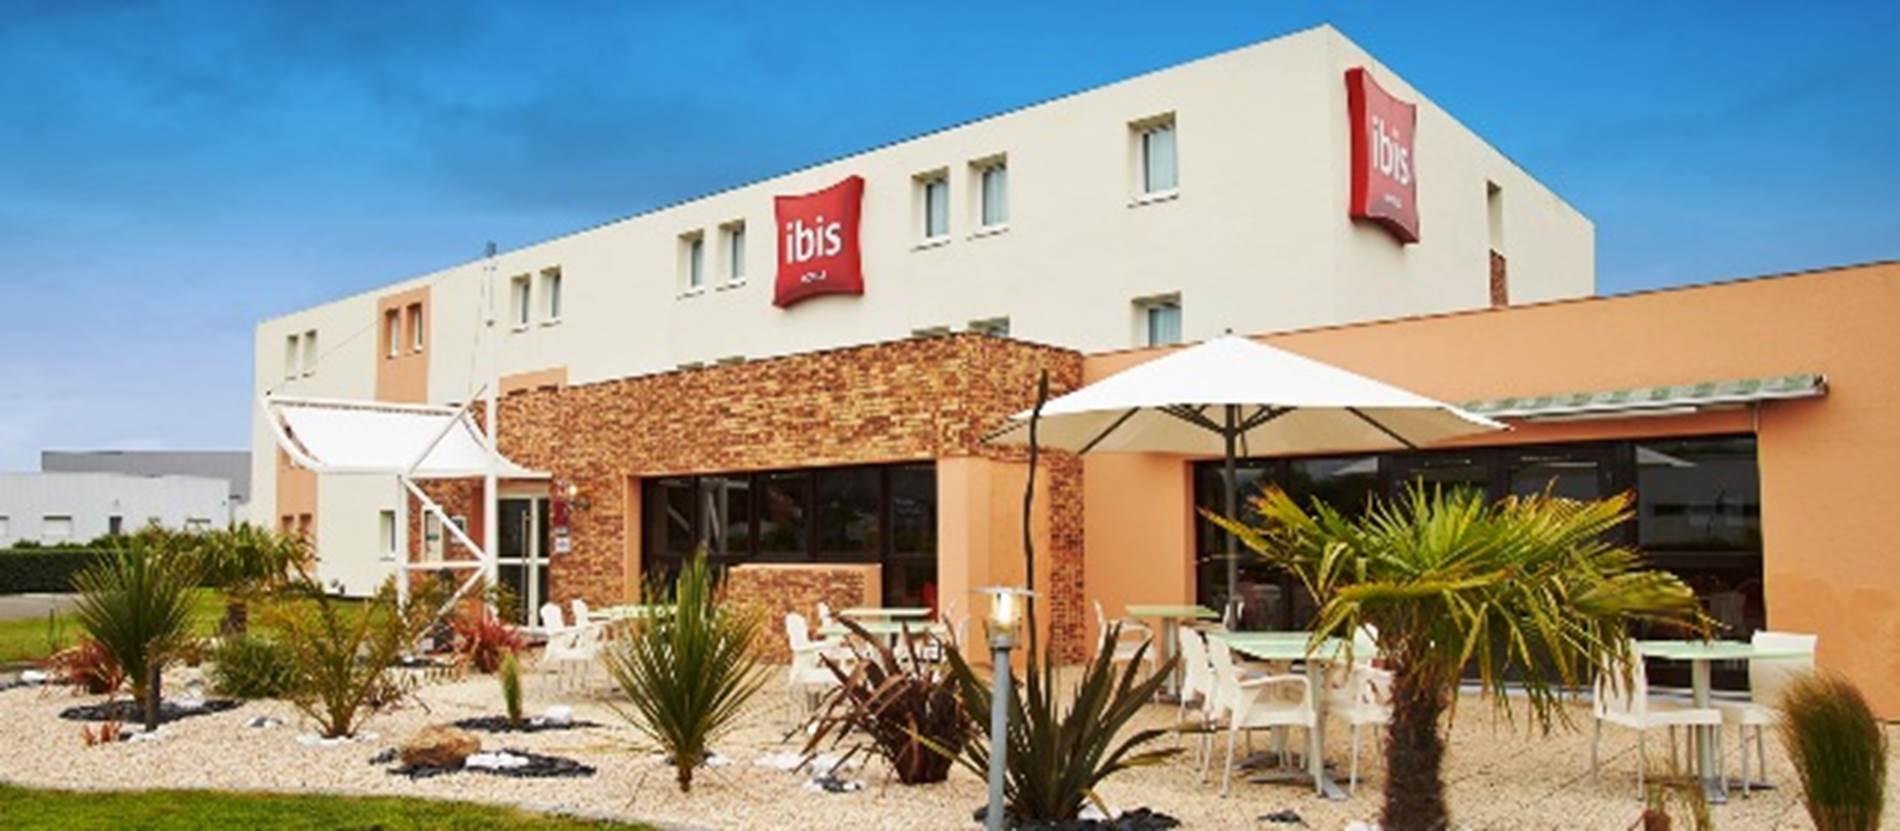 Hotel-Ibis-Auray-Morbihan-bretagne-Sud © ®studio-FUN-IMAGES